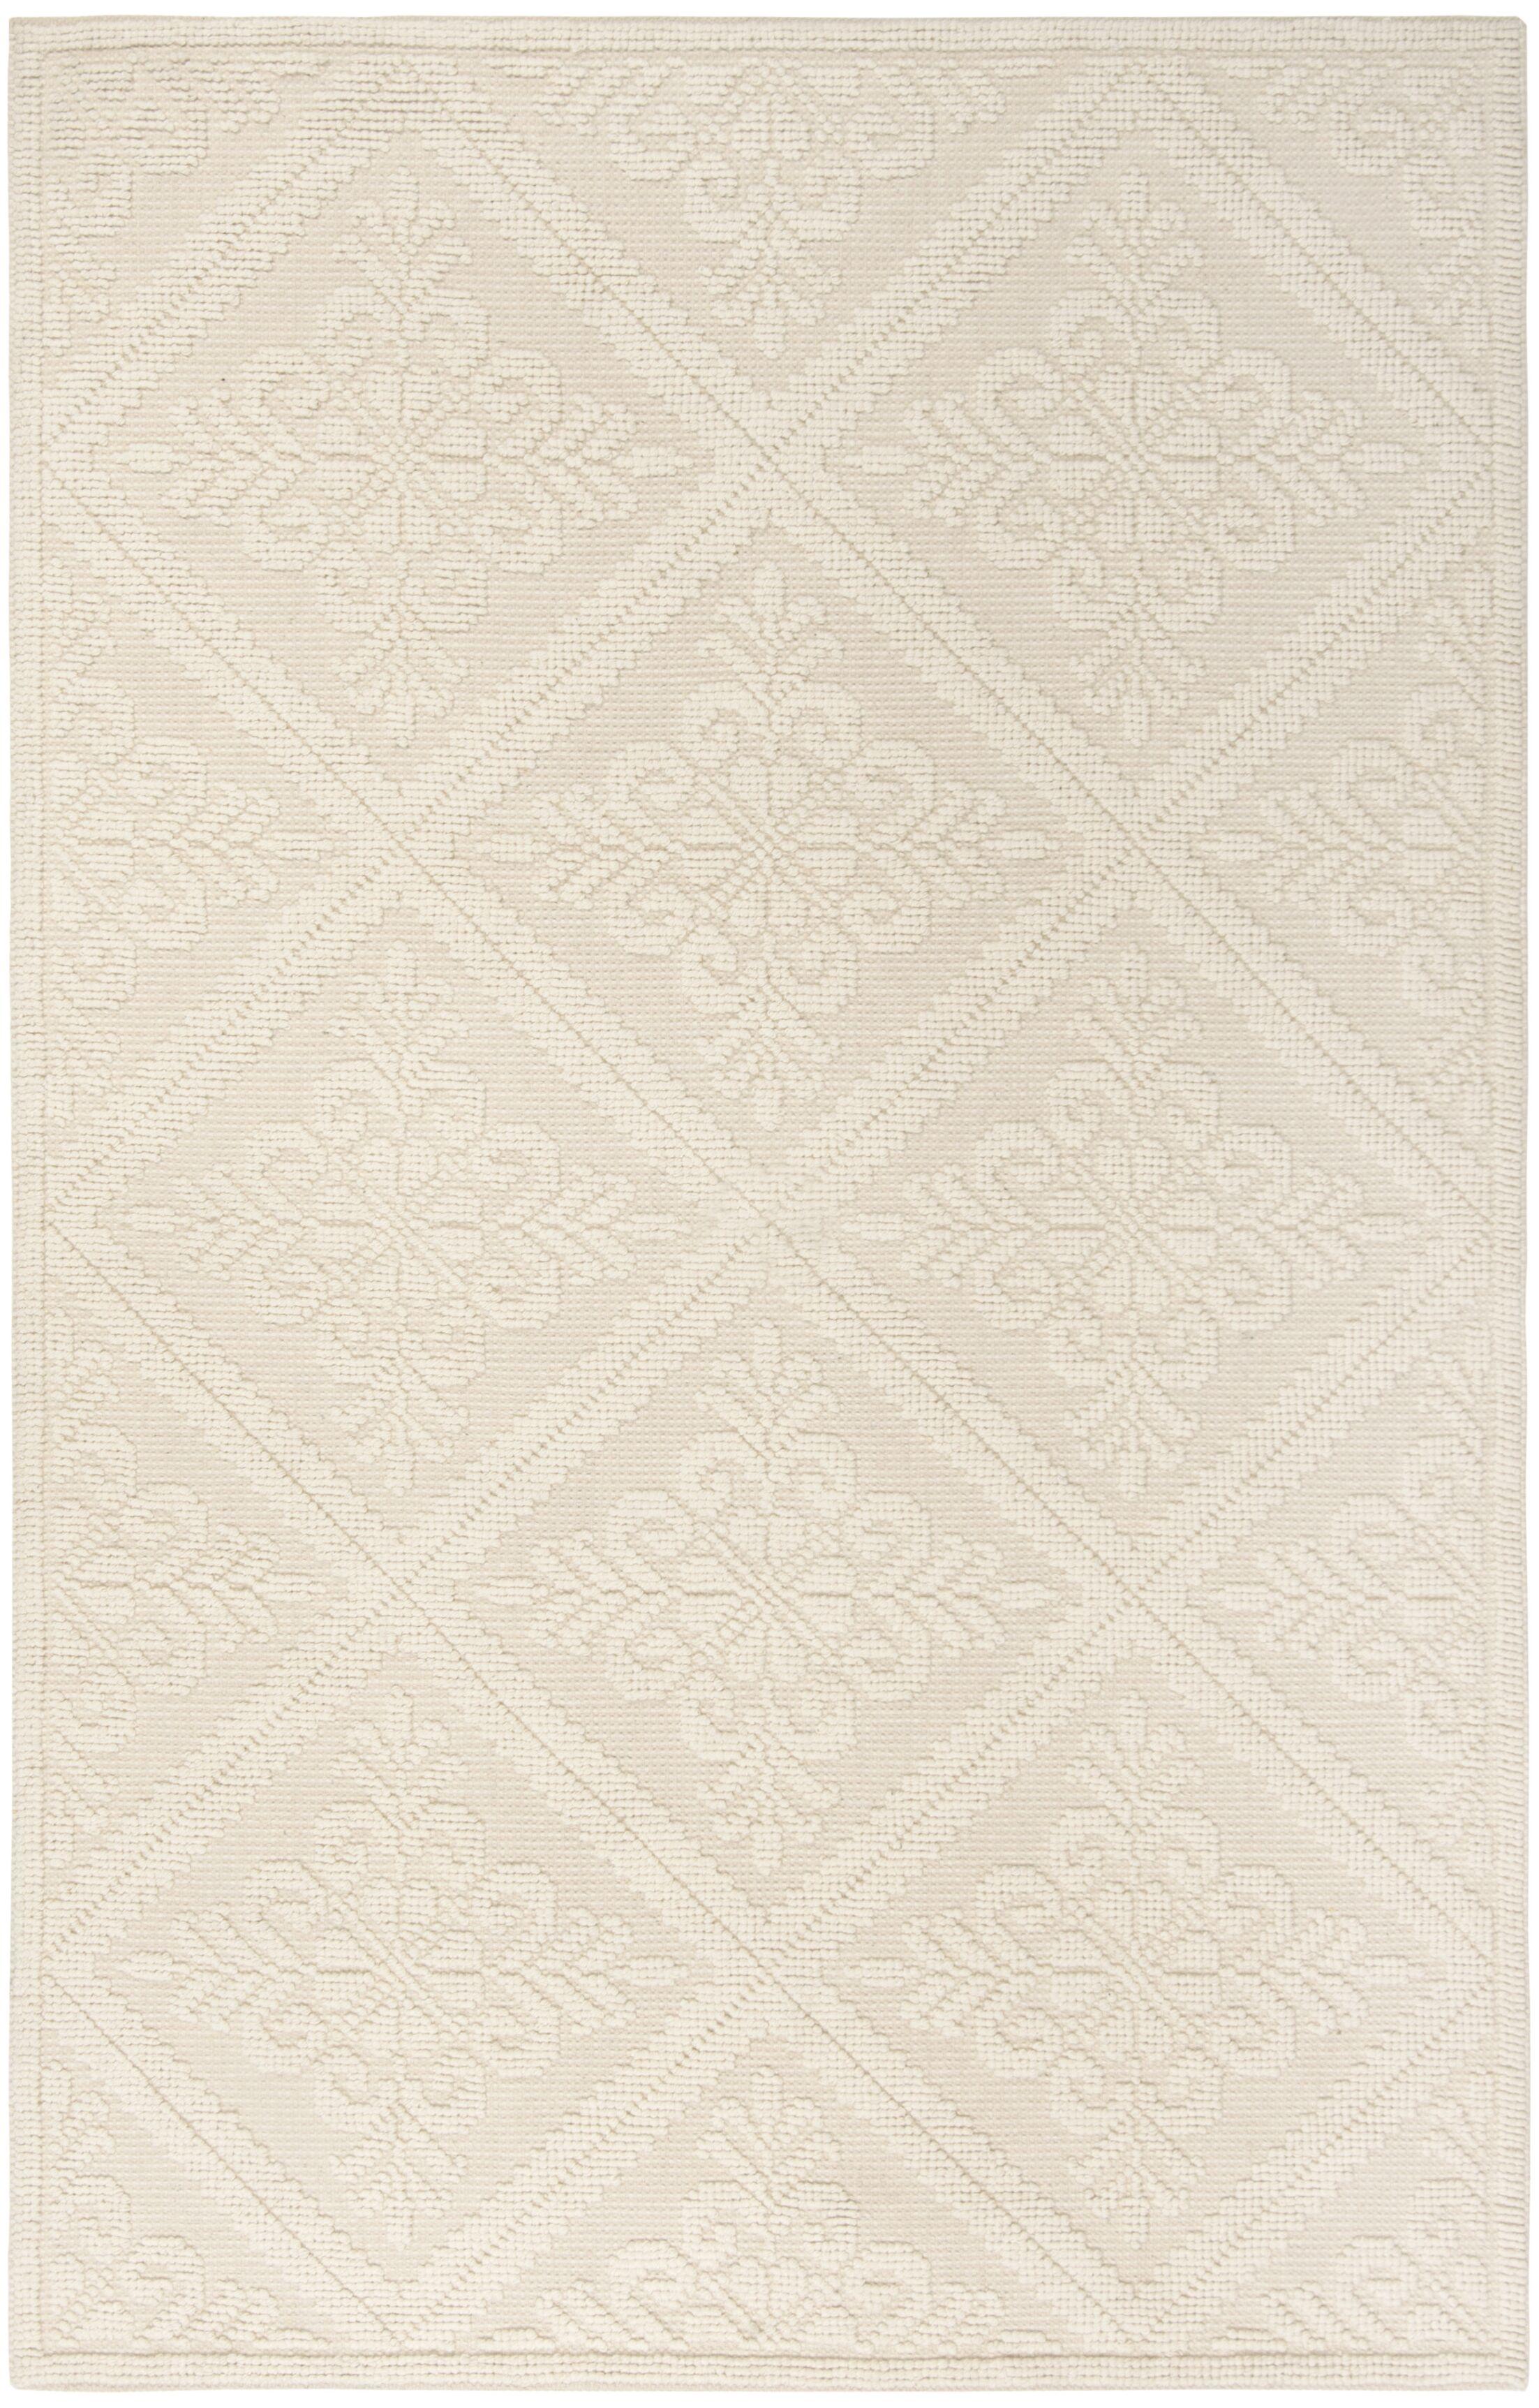 Kelty Hand-Woven Wool Ivory Area Rug Rug Size: Rectangle 6' x 9'